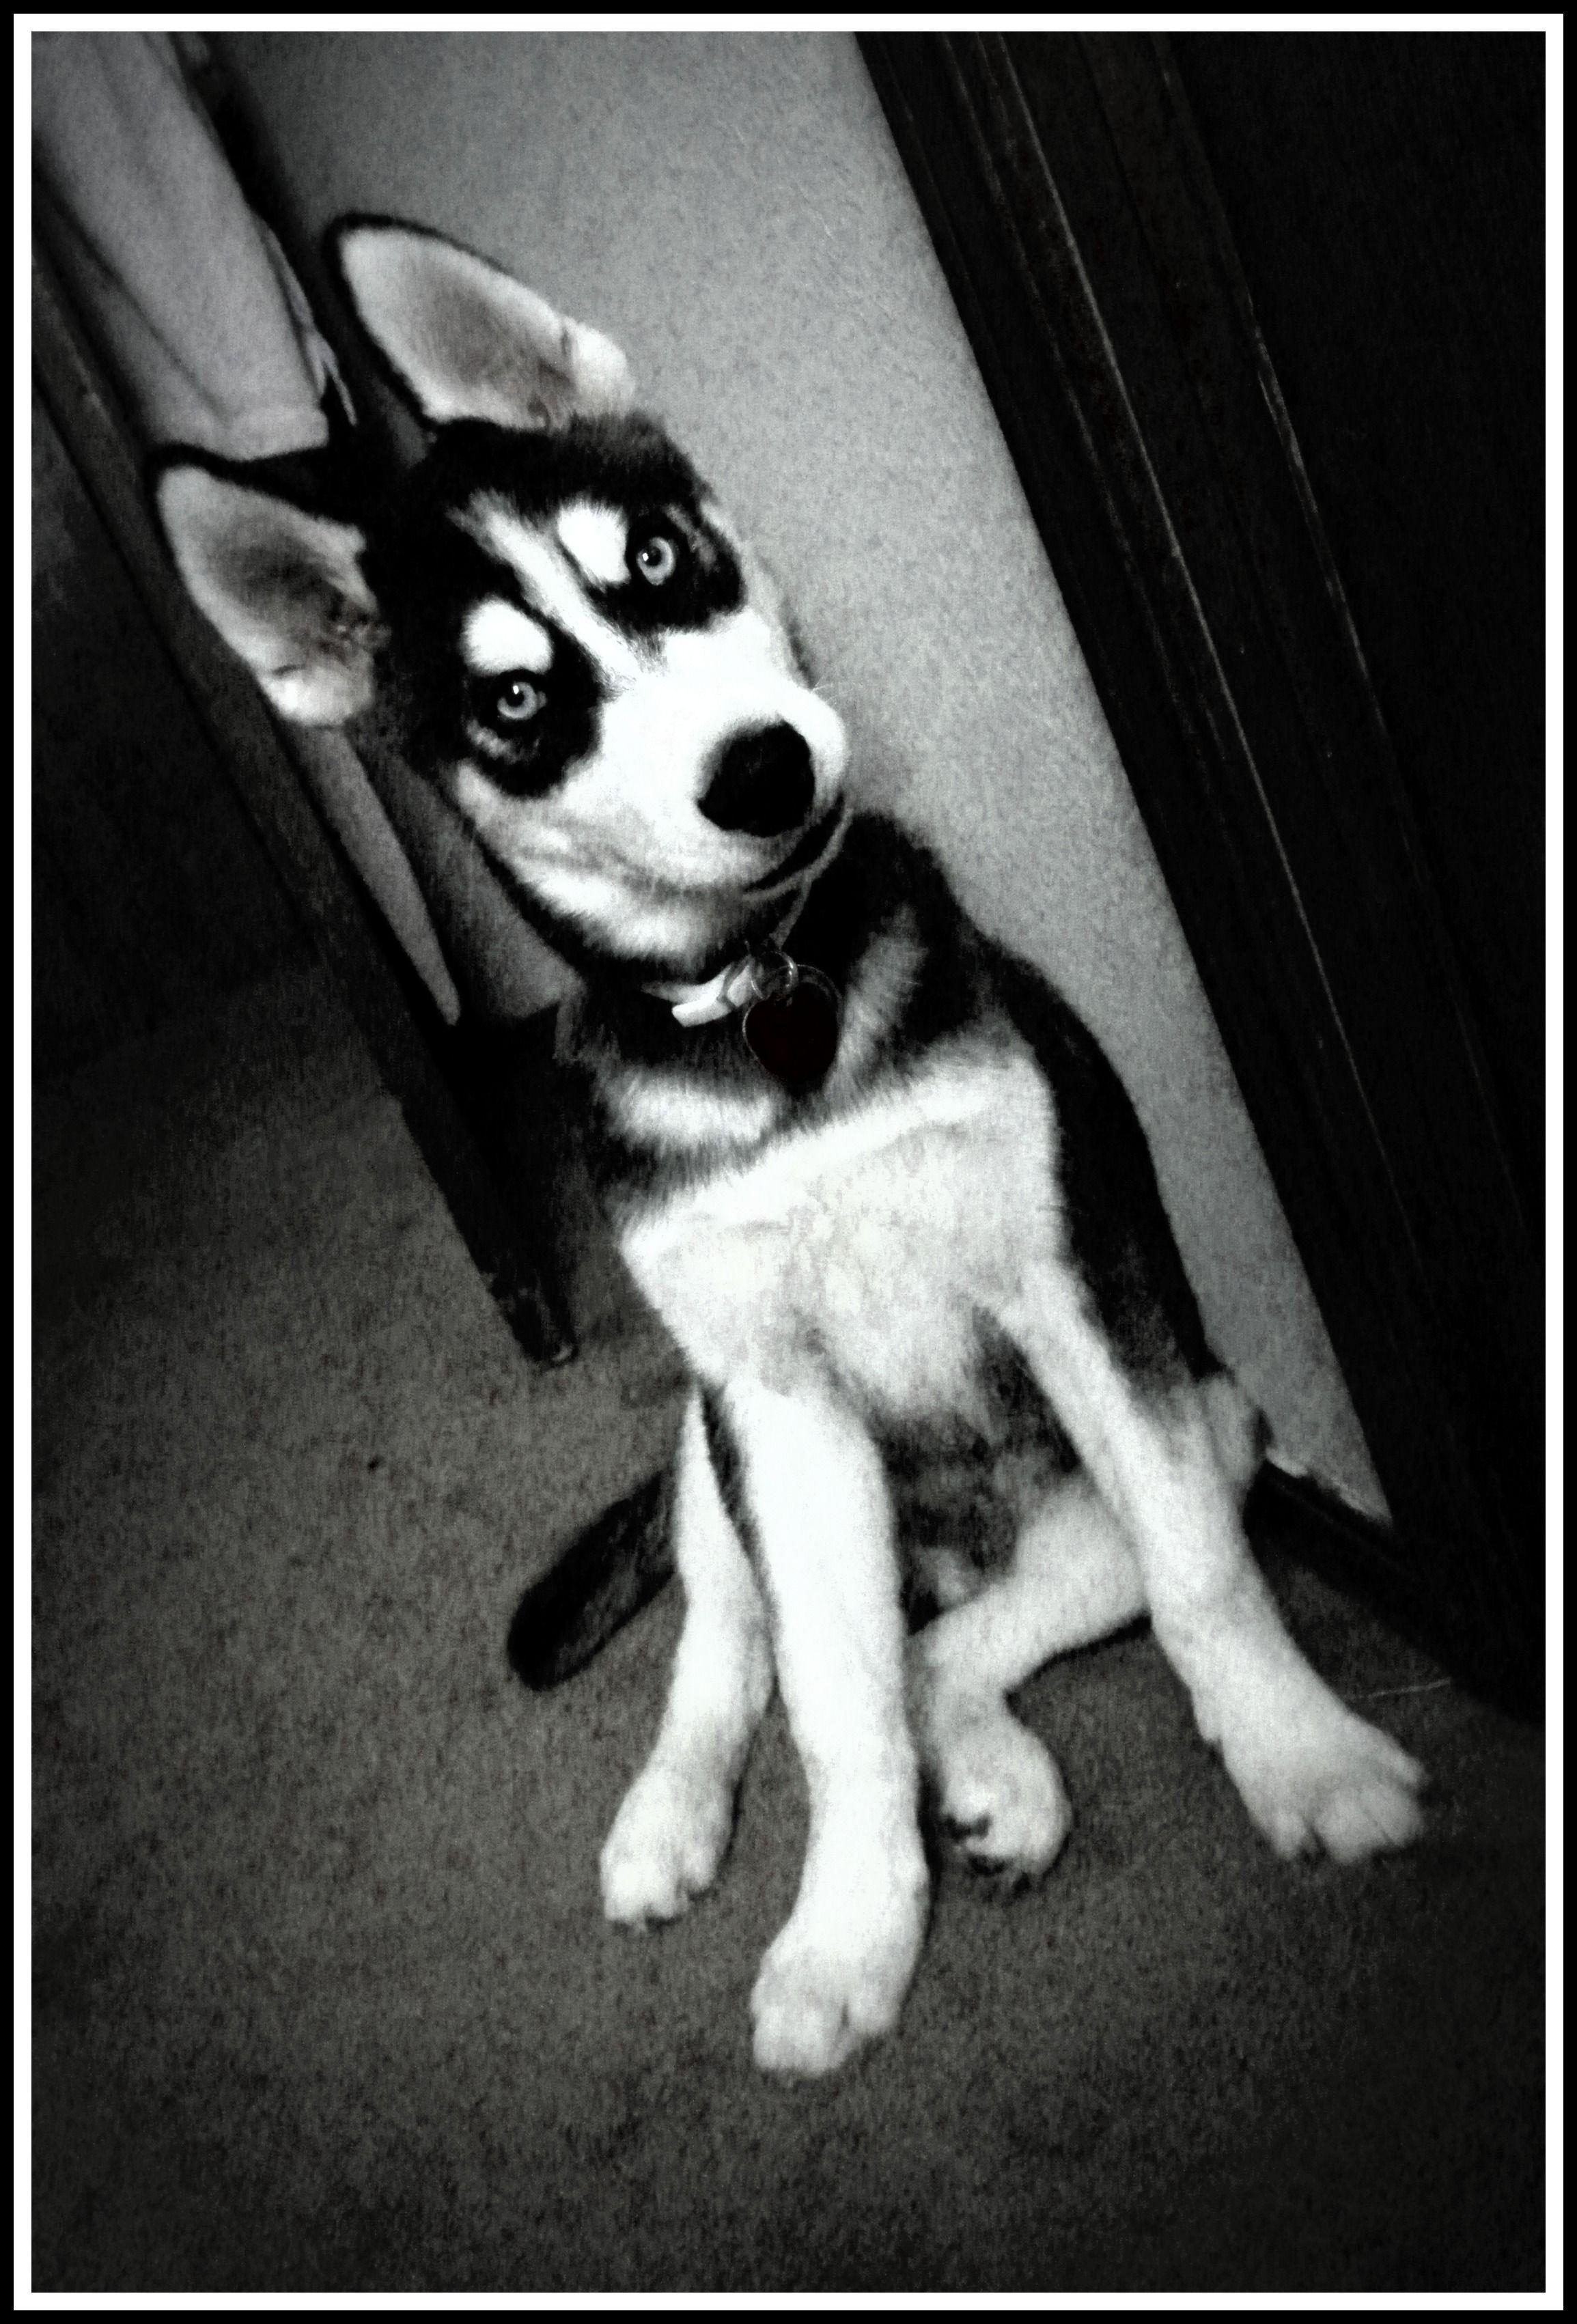 Our husky baby Kodah